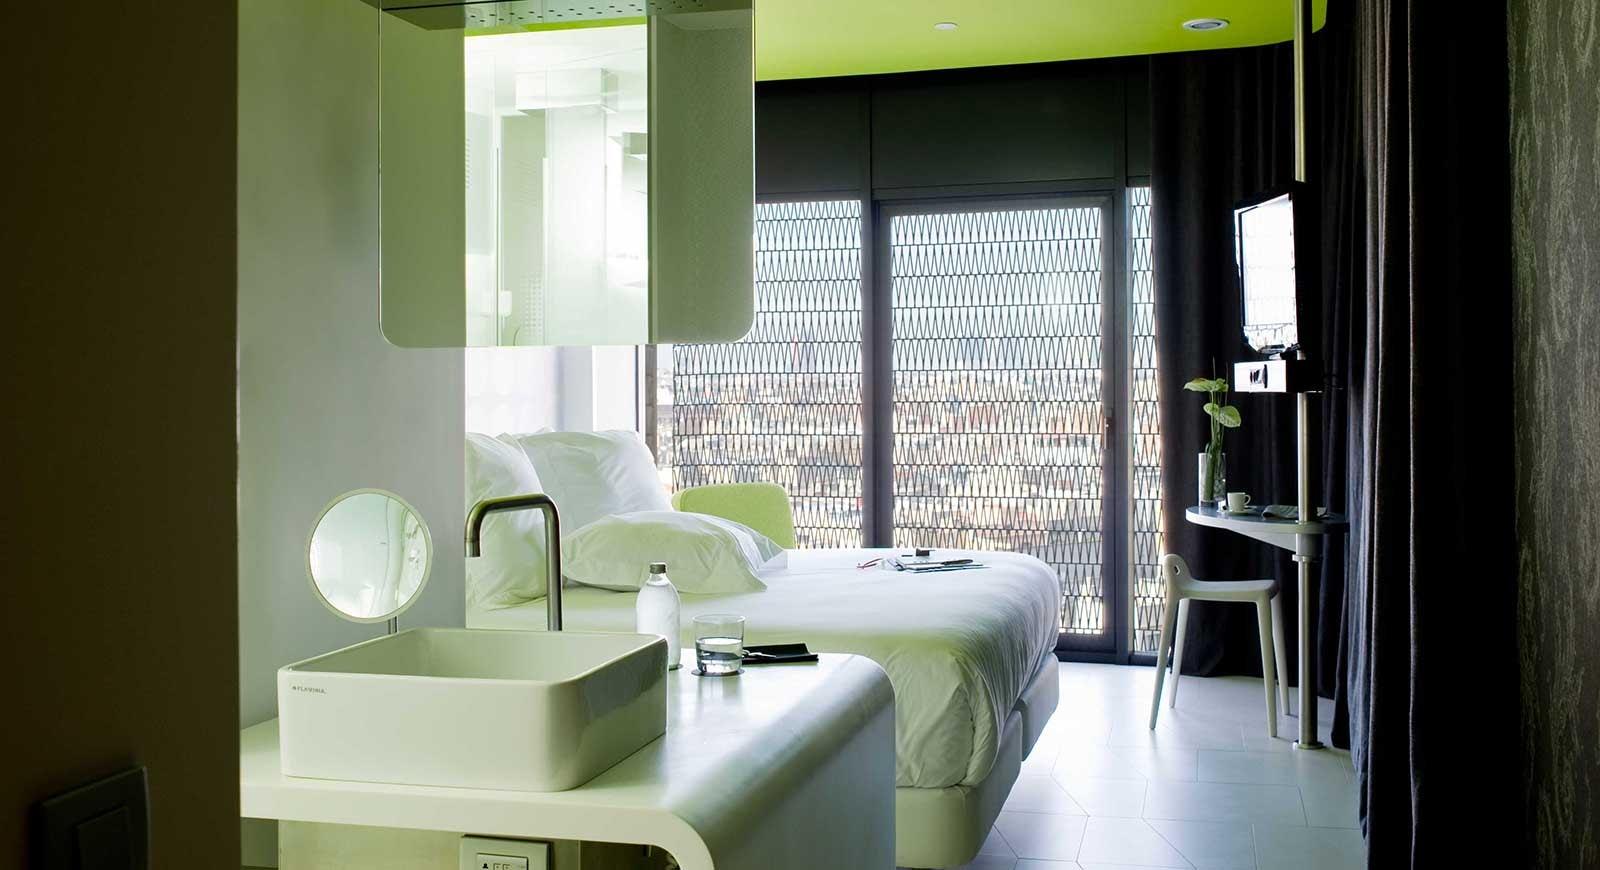 Barceló Raval room